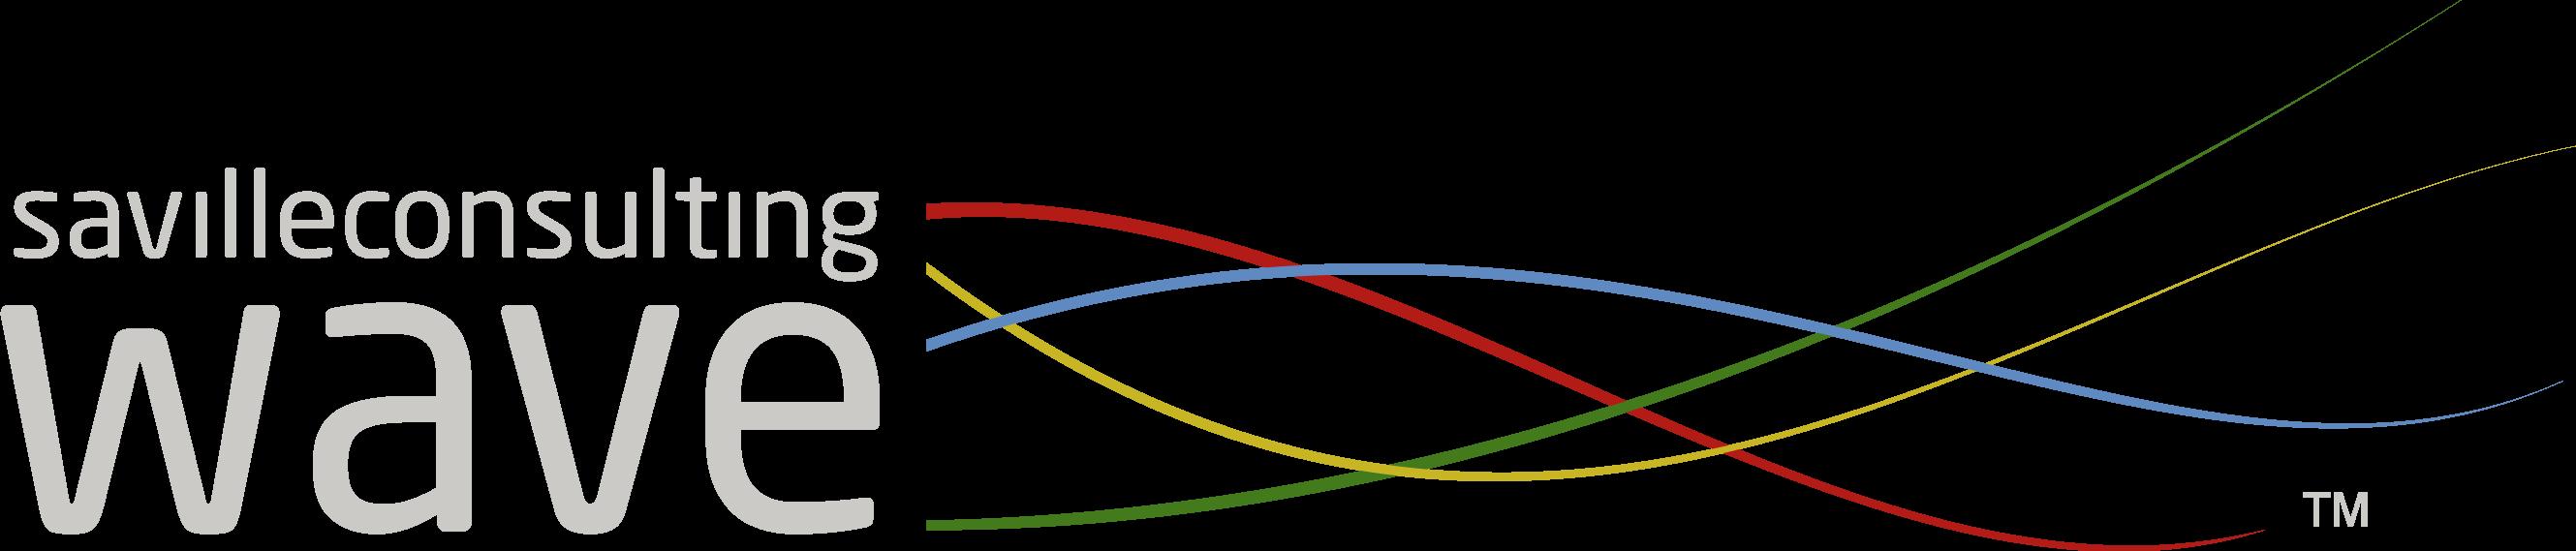 Модель компетенций Wave компании Saville Consulting